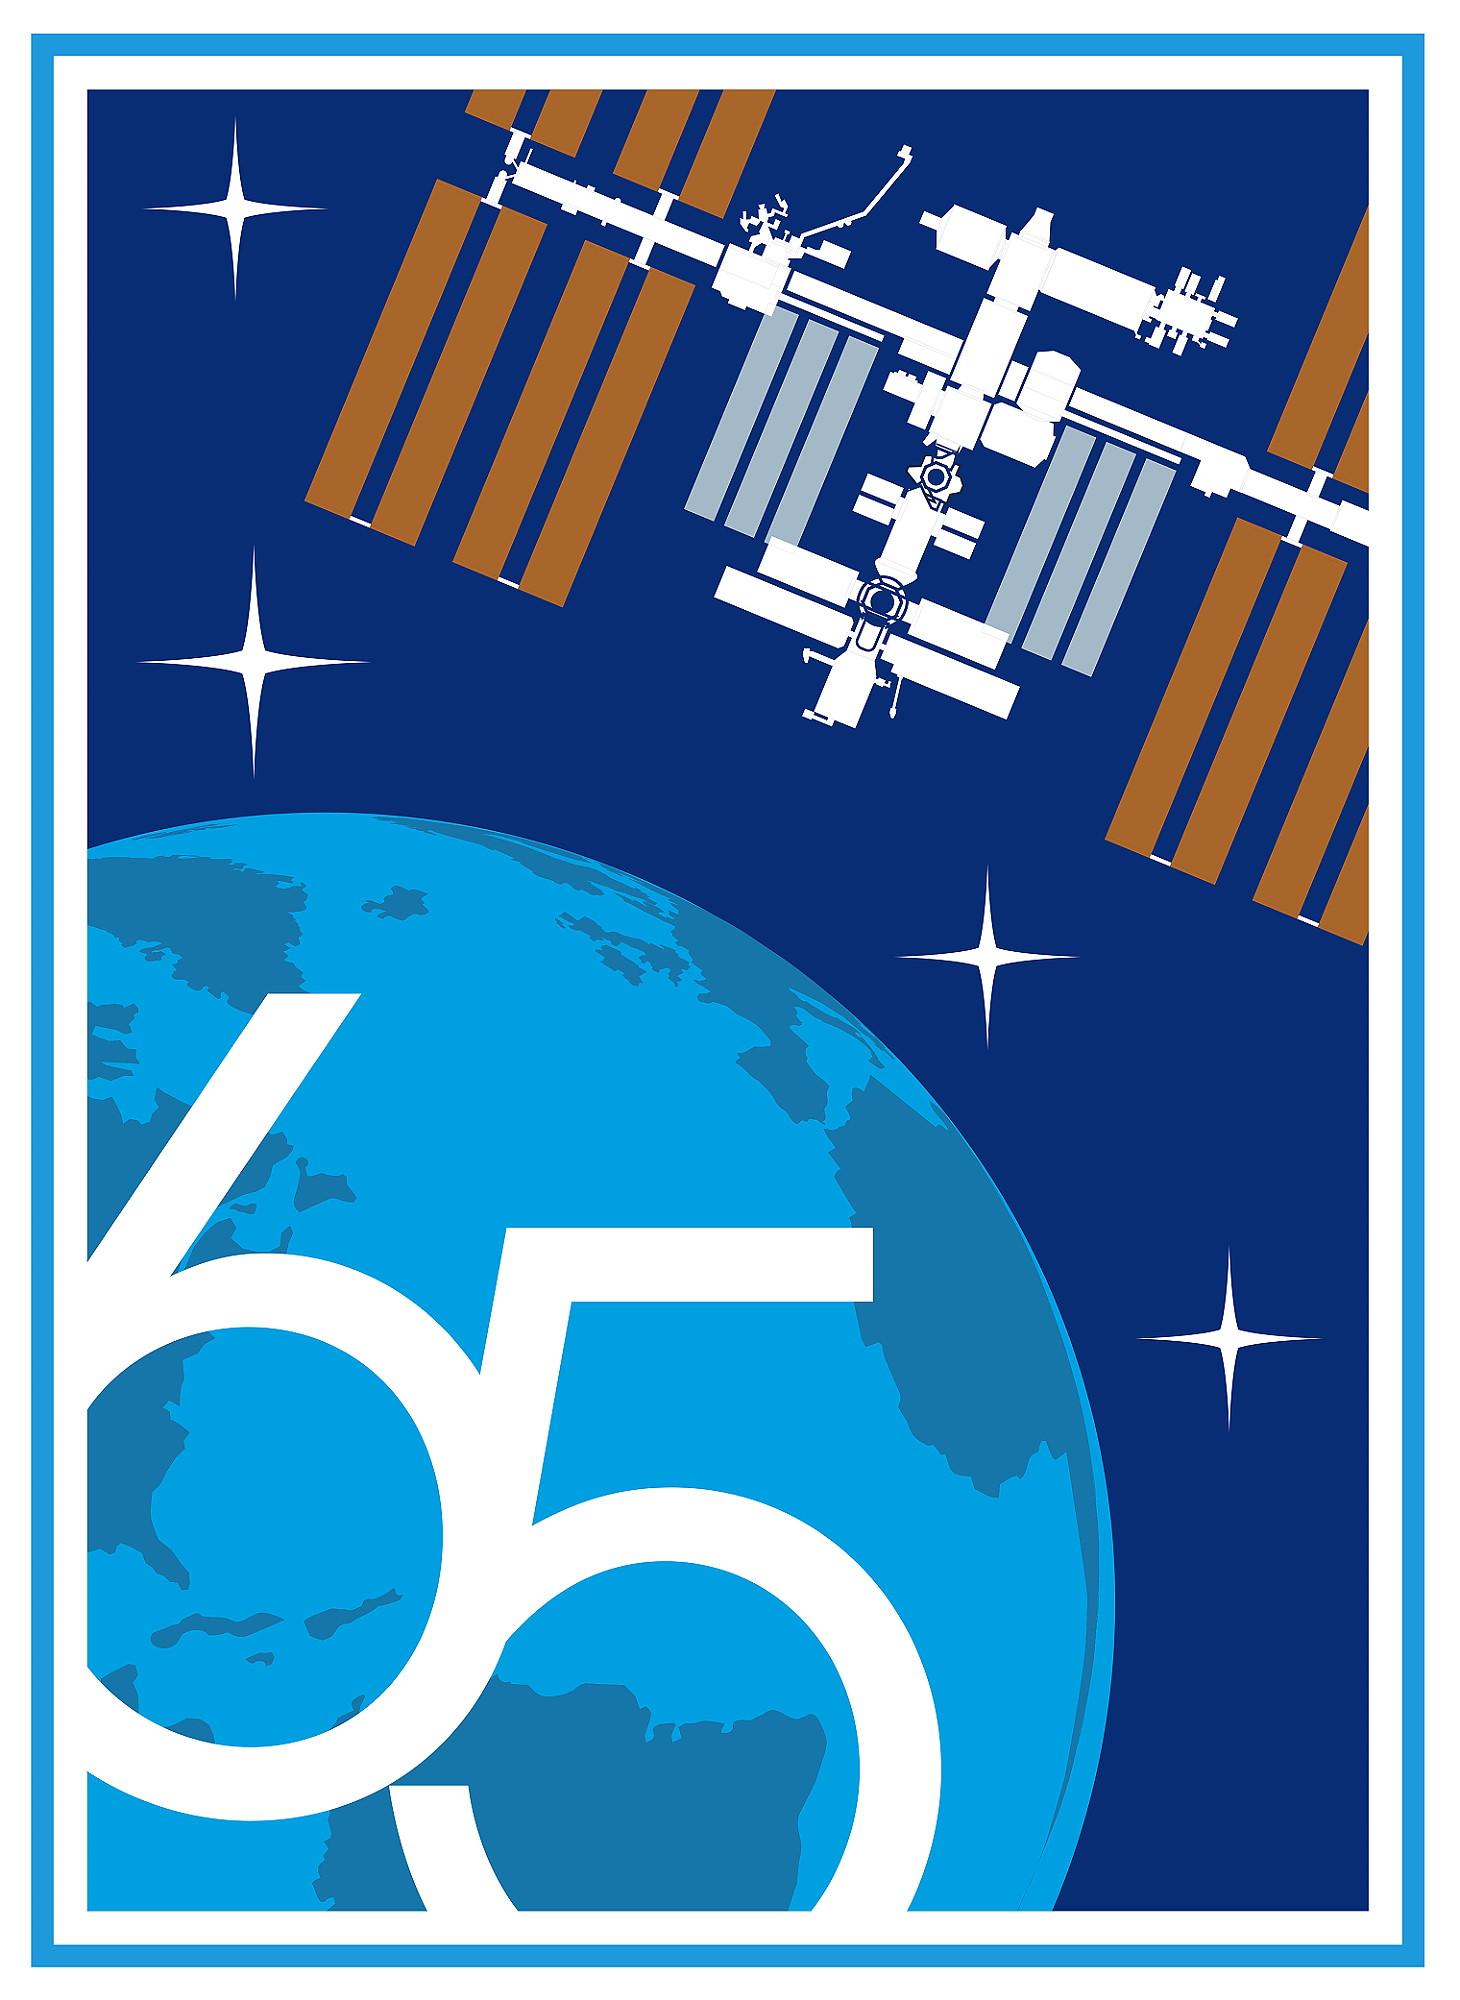 [ISS] Expédition 65 EhnadRmU4AQUZZg?format=jpg&name=large